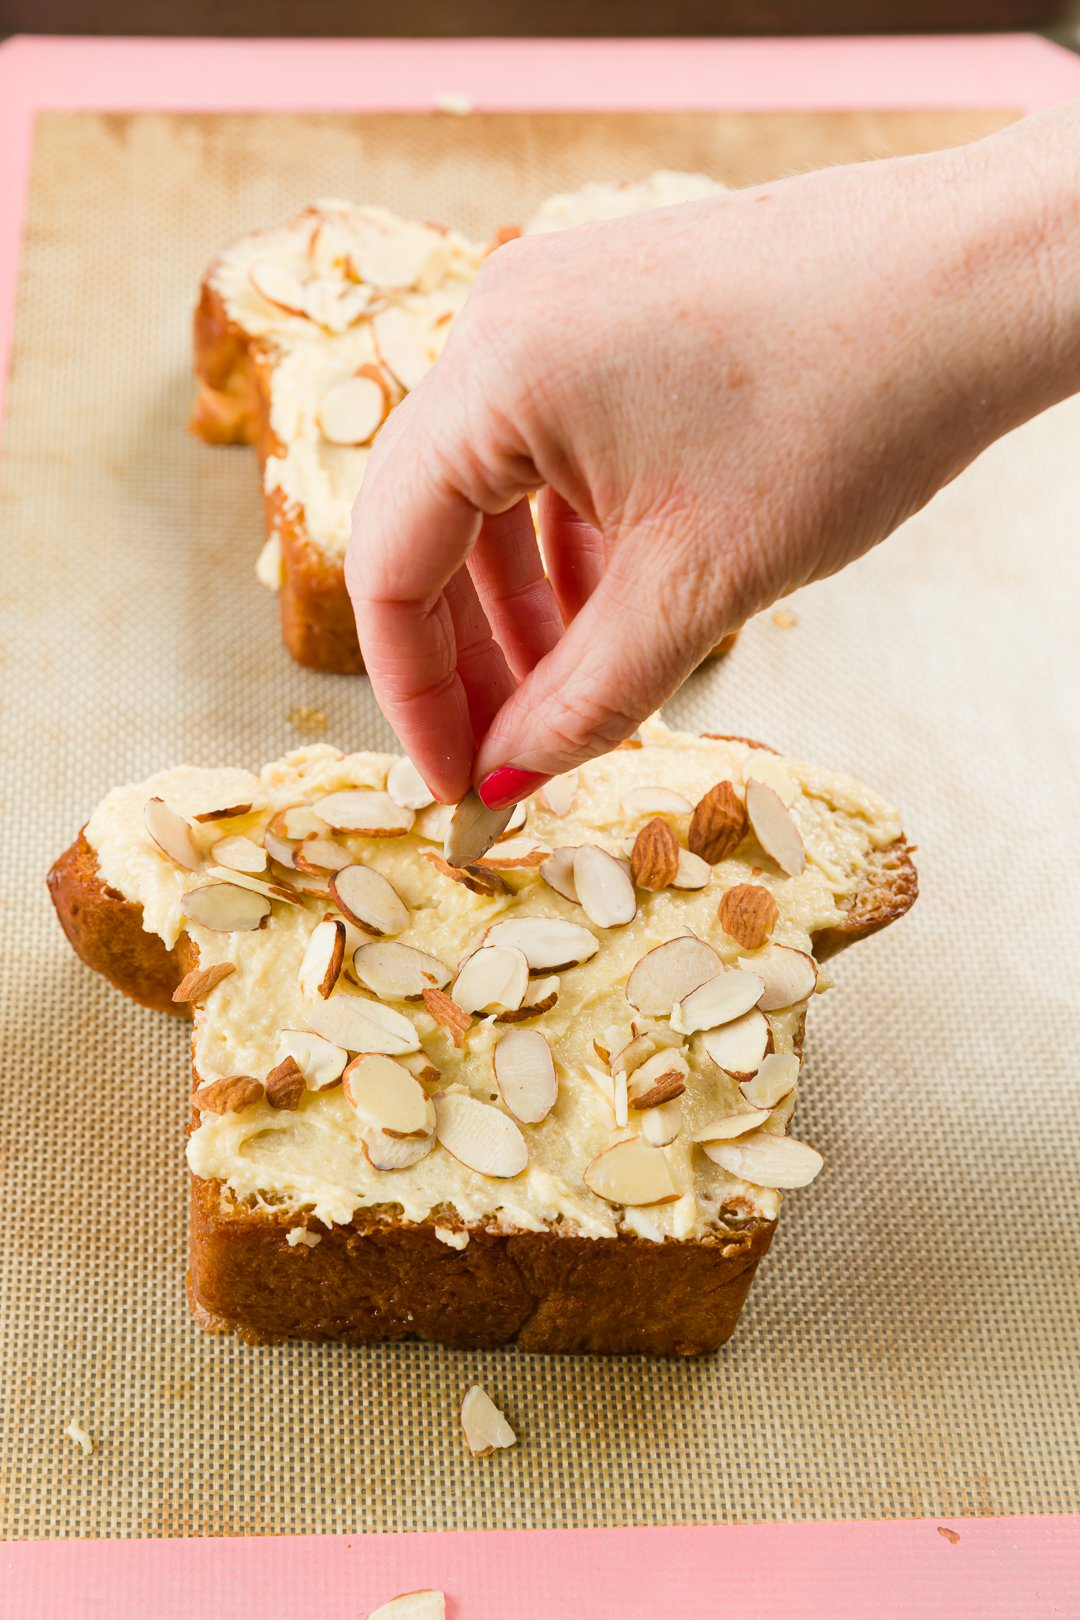 Sprinkling almonds on bostock